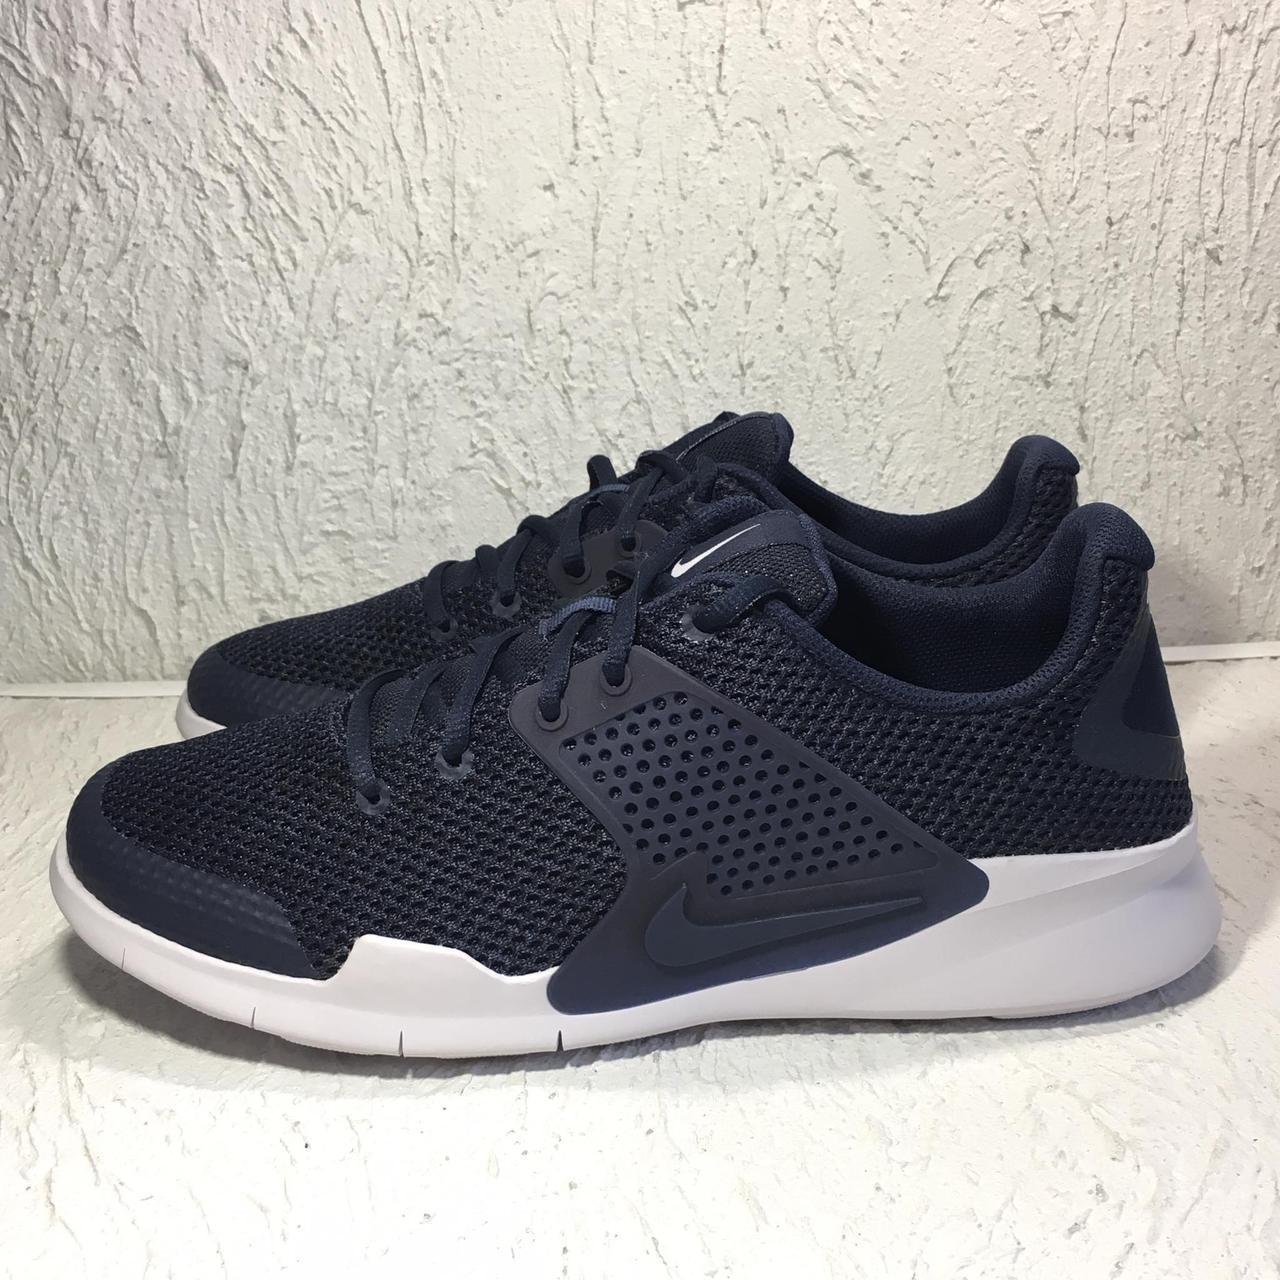 Кроссовки Nike Arrowz Se Shoe 916772 401 44 размер